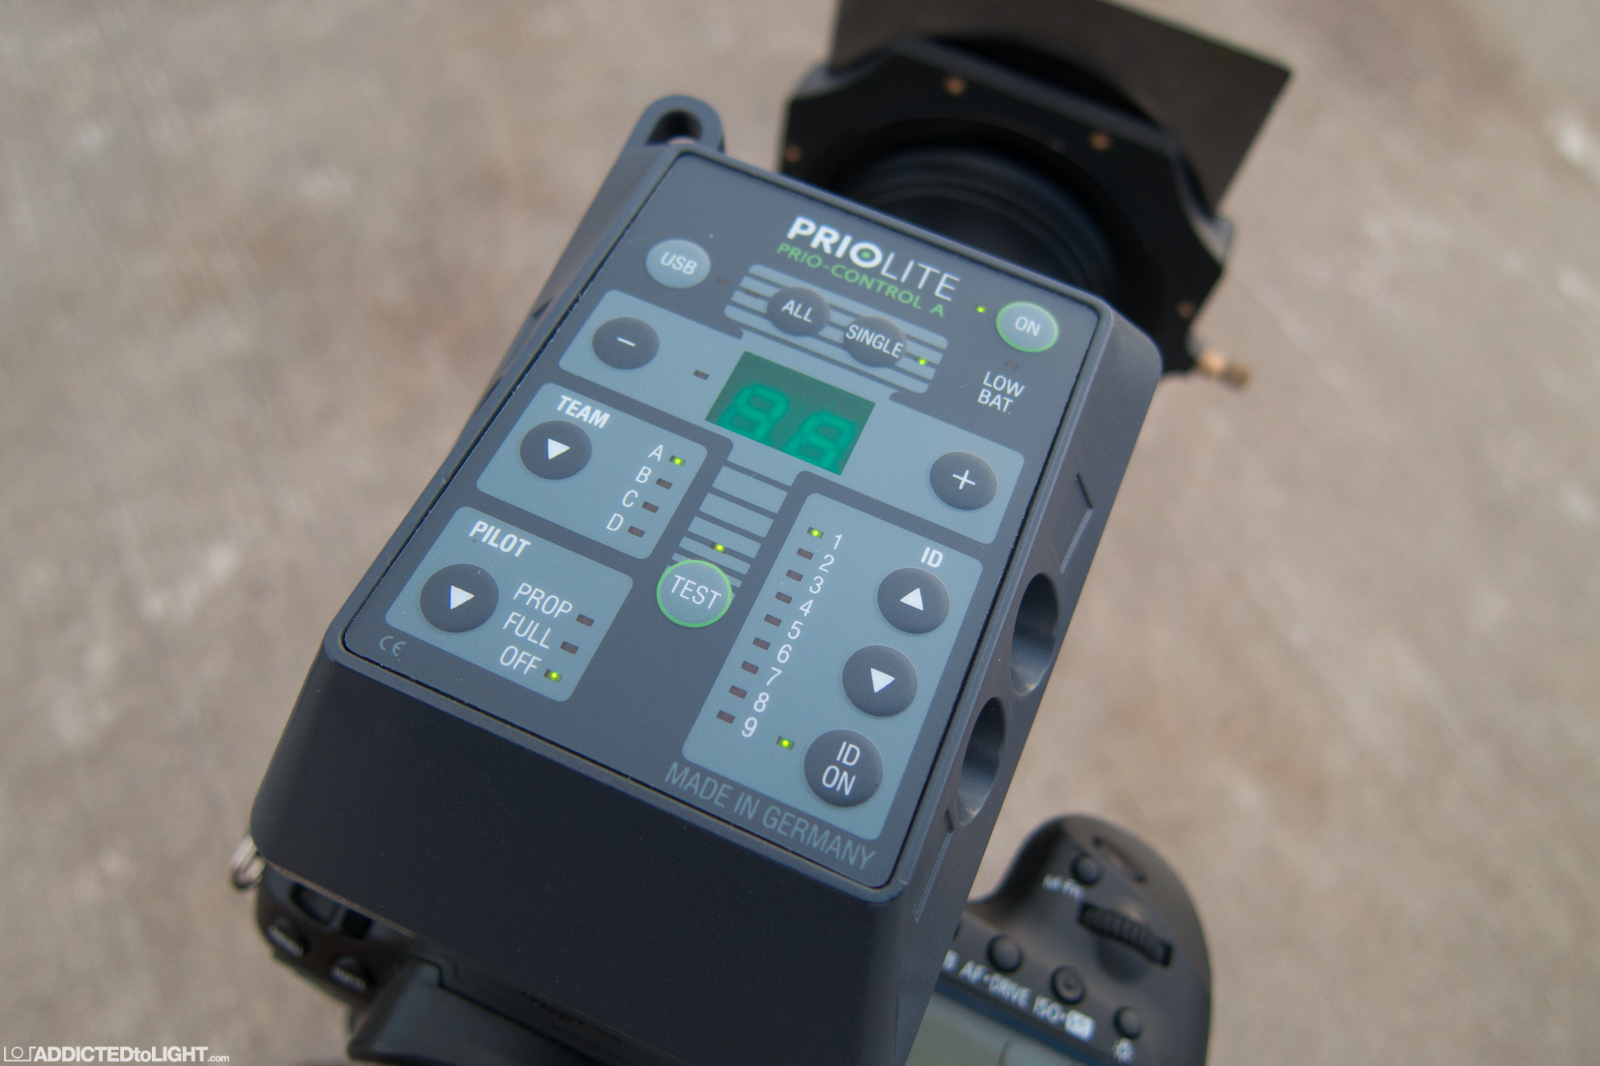 Priolite MBX500 Hotsync 010